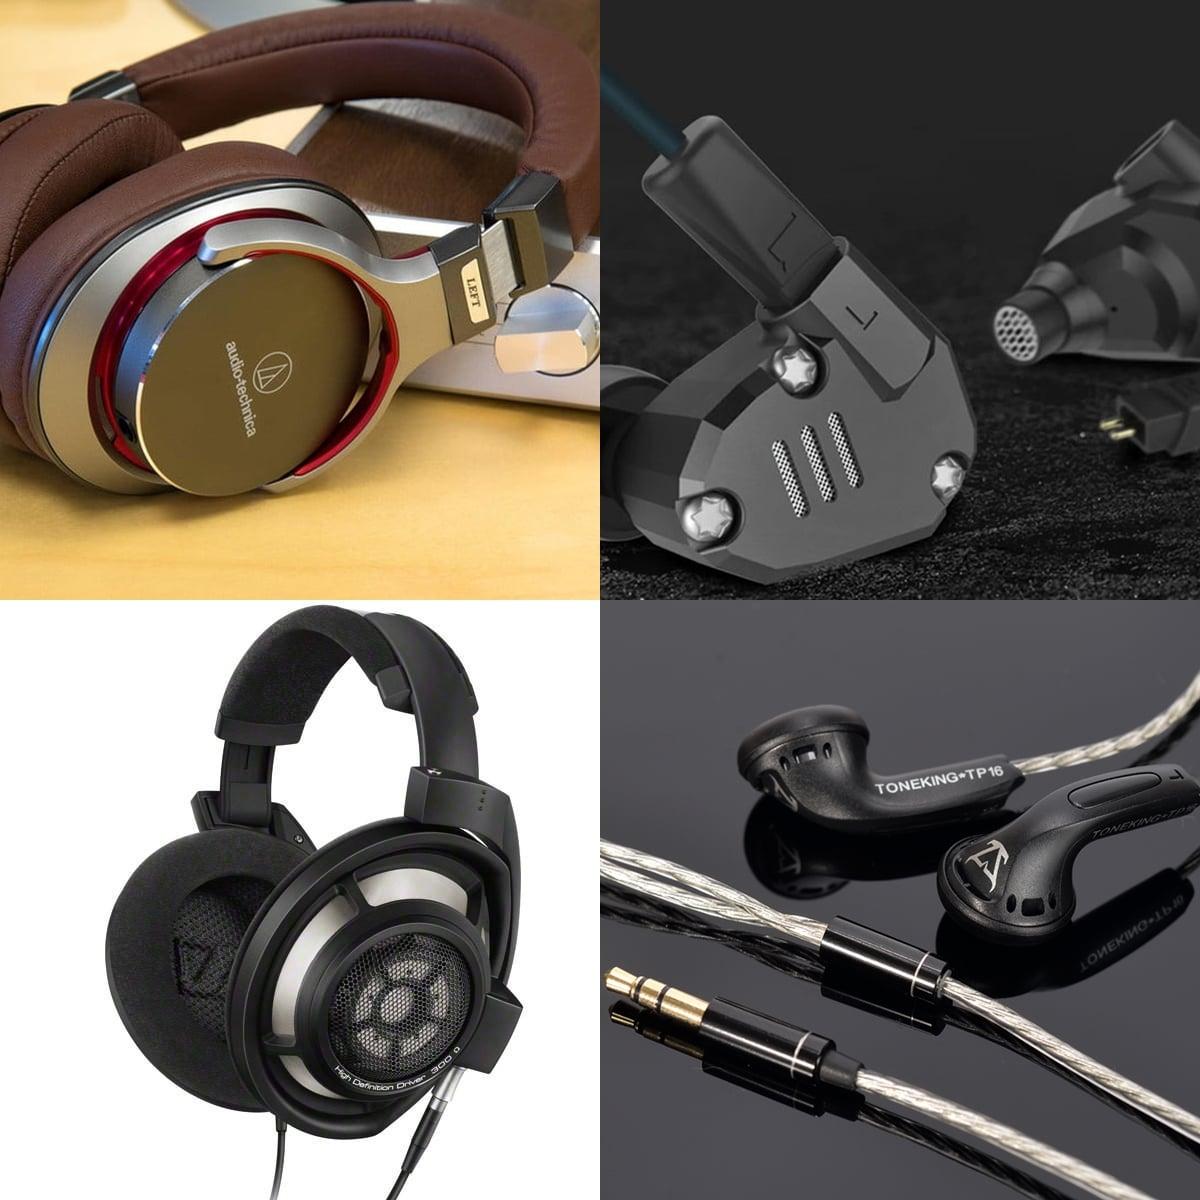 jenis_earphone_dan_headset